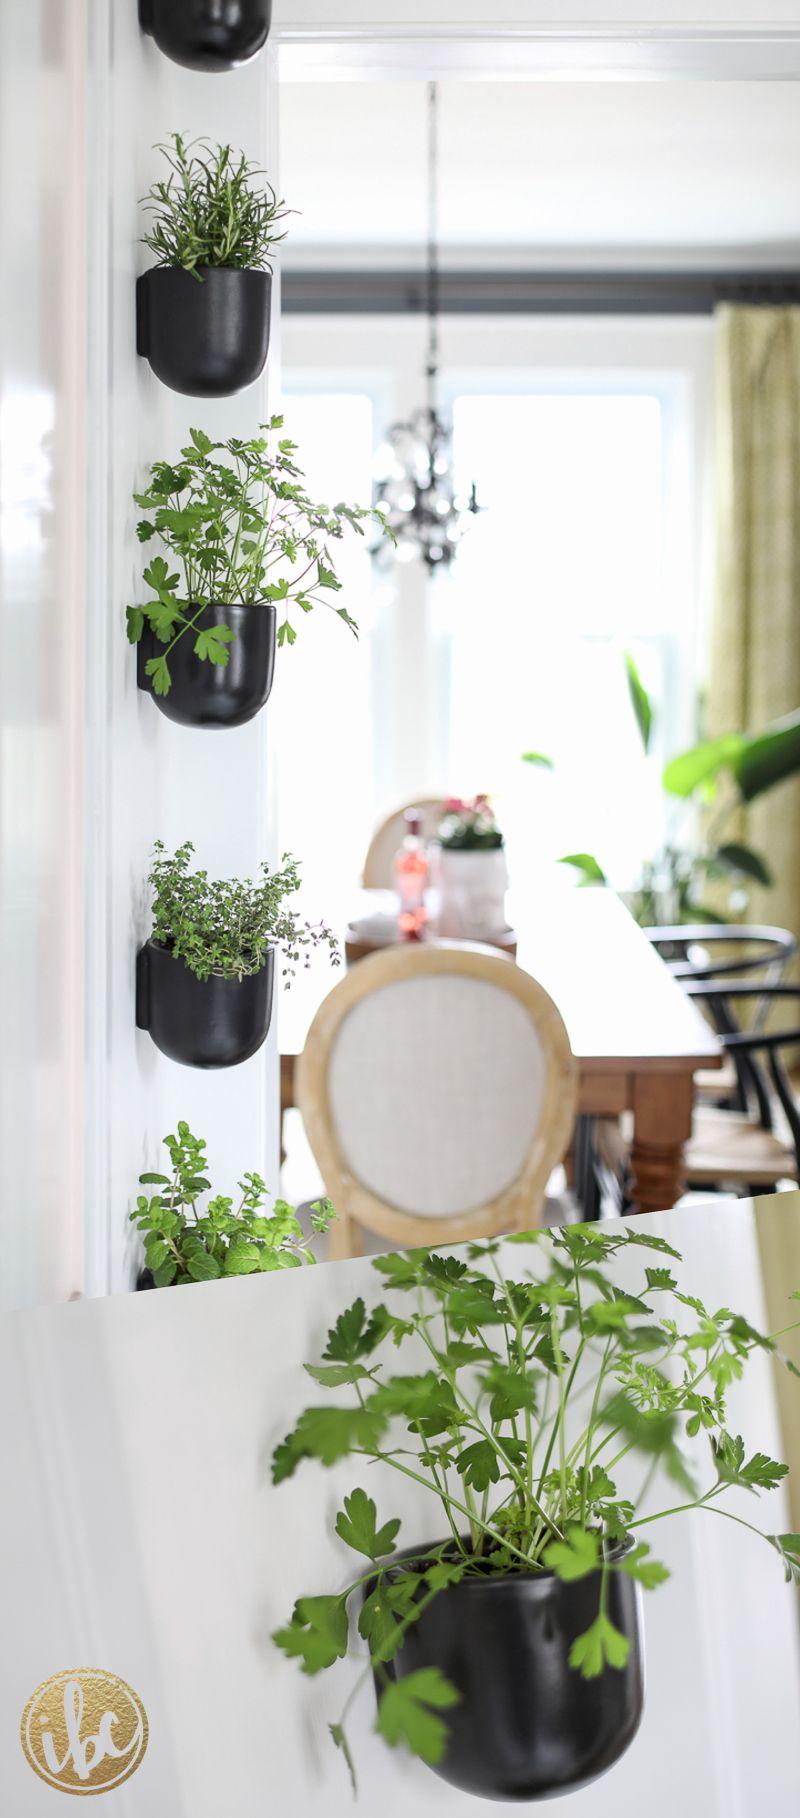 modern hanging kitchen herb garden wall planters diy on indoor vertical garden wall diy id=61045